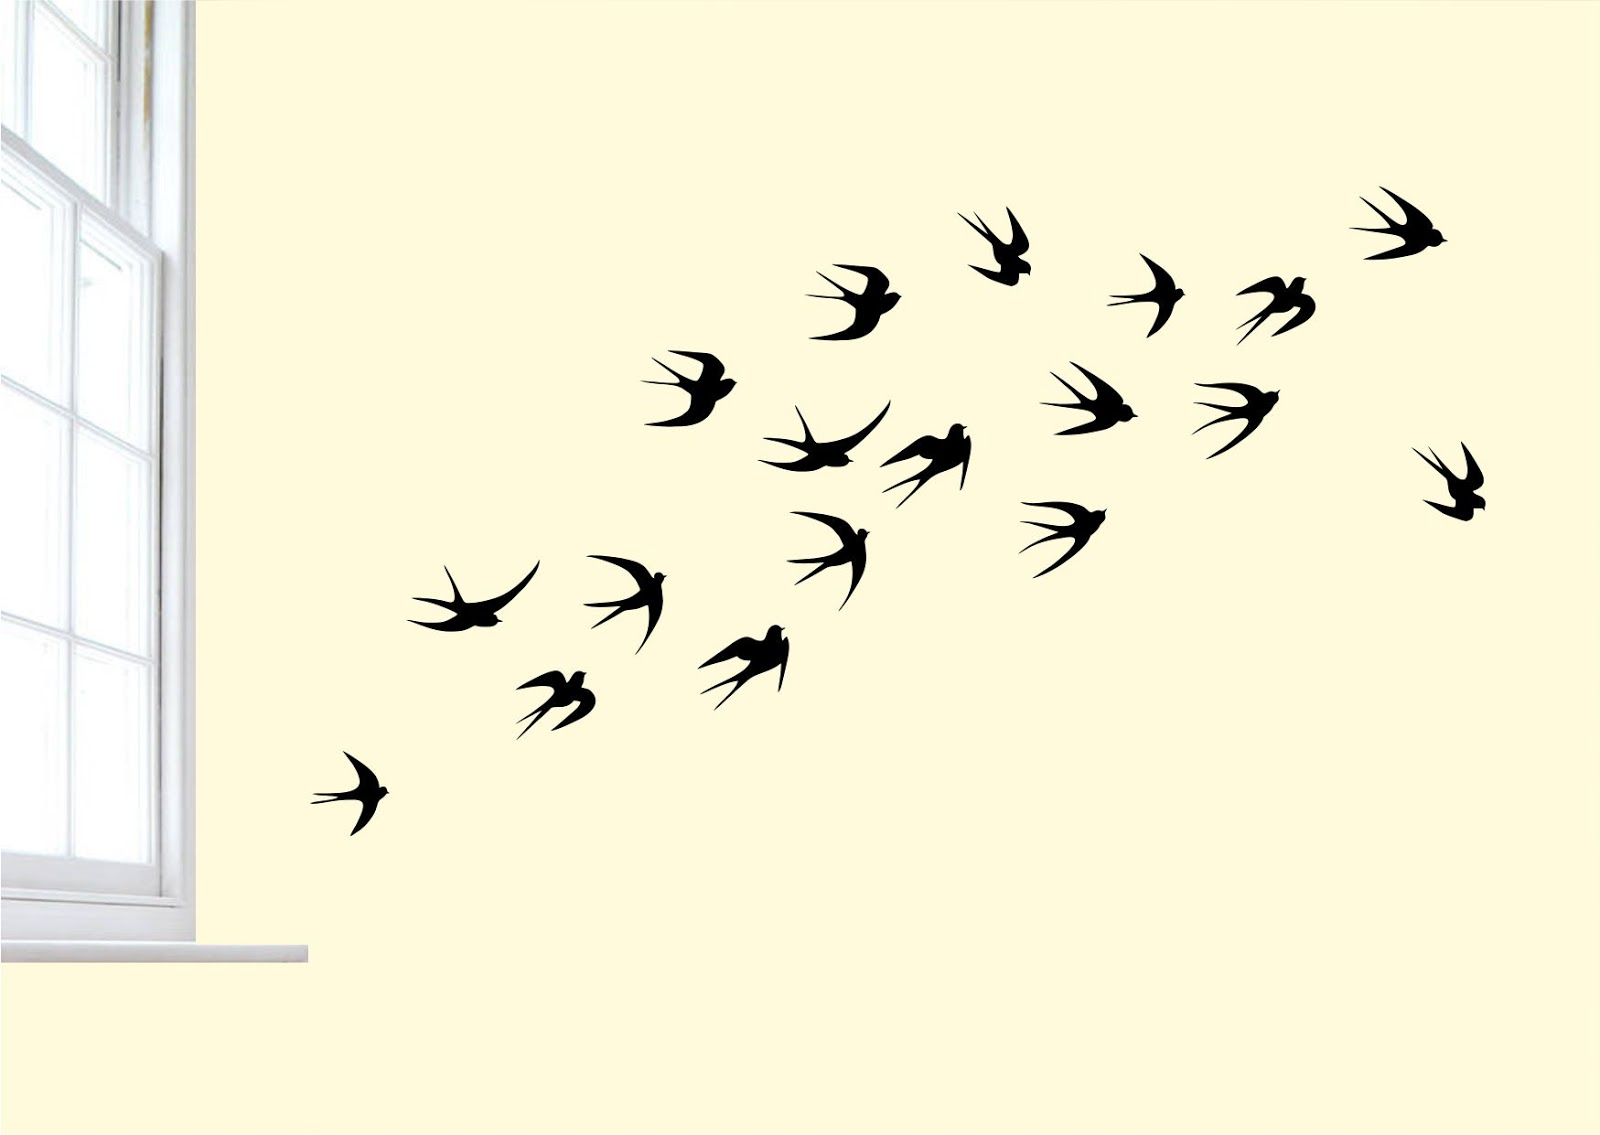 Birds flying tattoo template